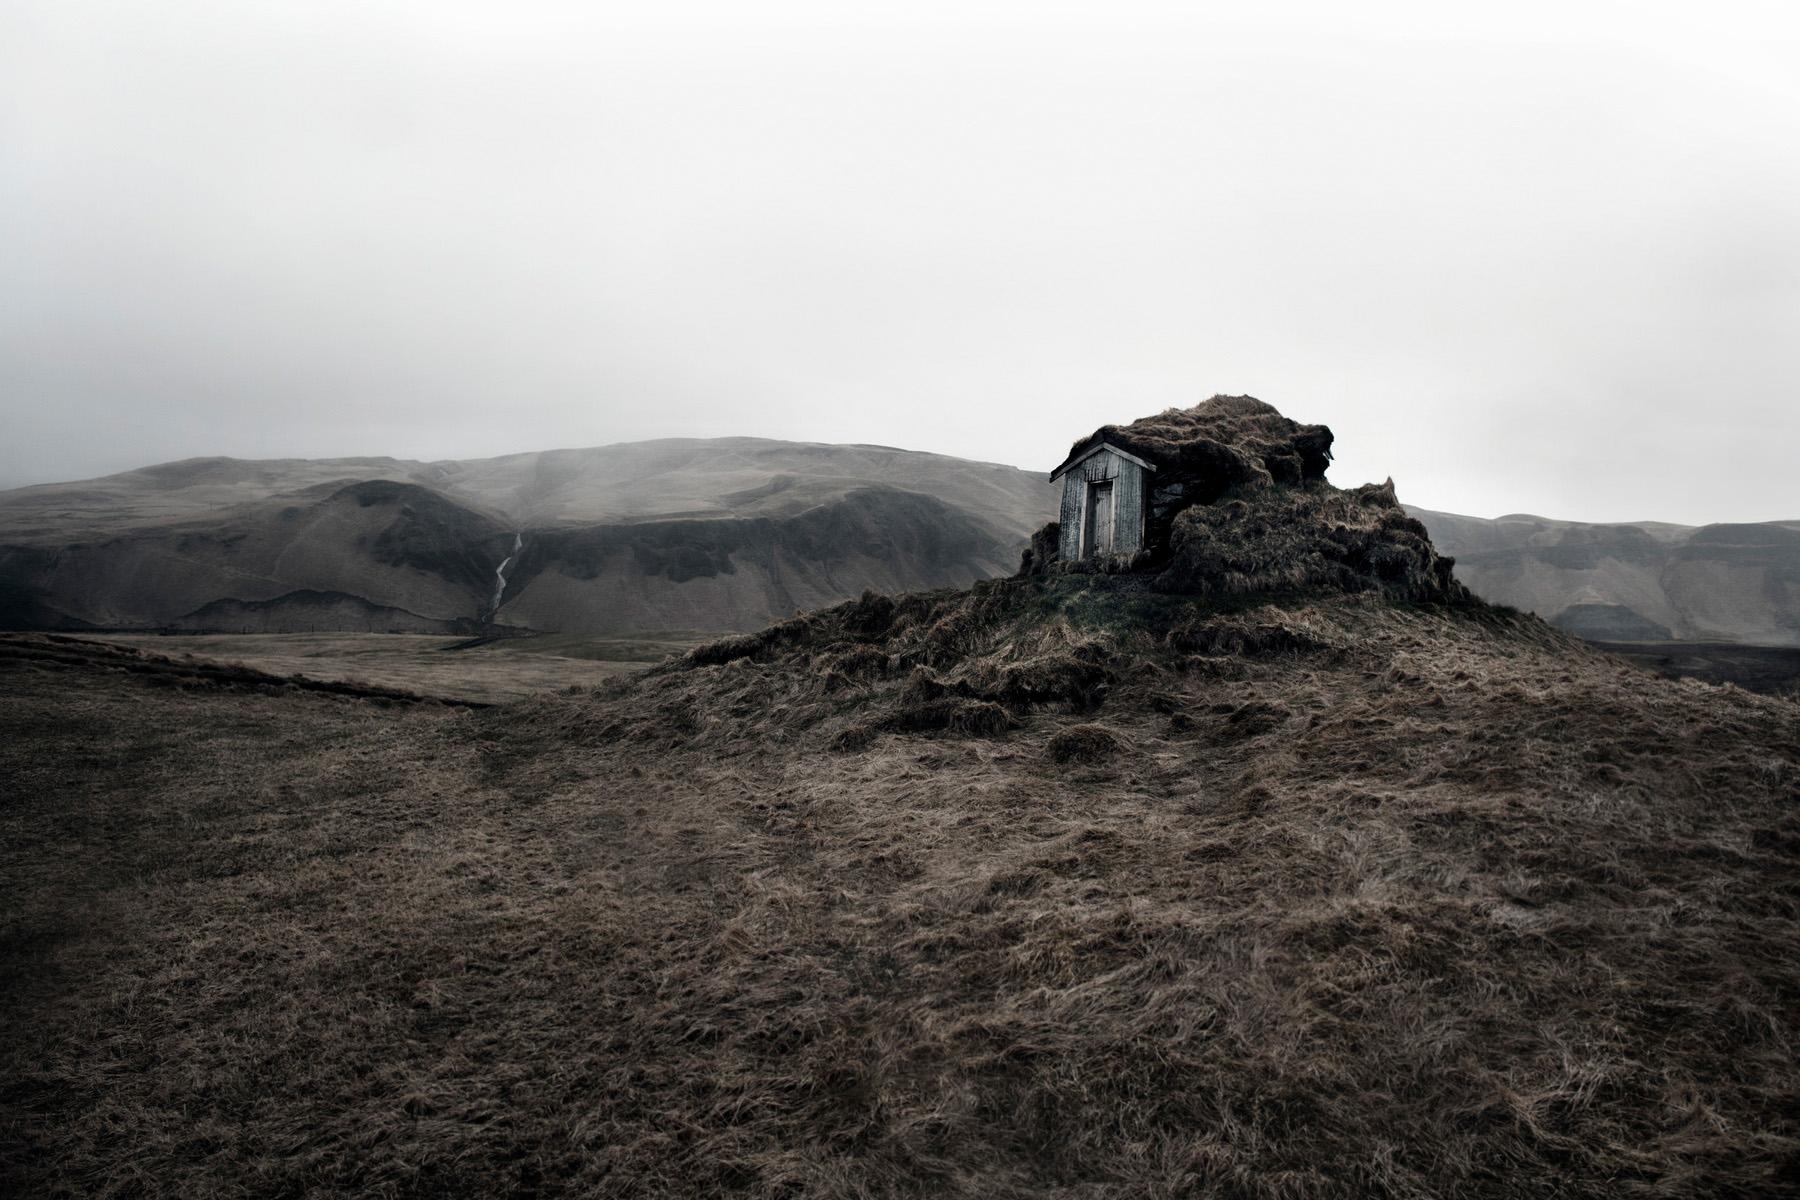 218807-11227730-Iceland_Day02-000281_jpg.jpg